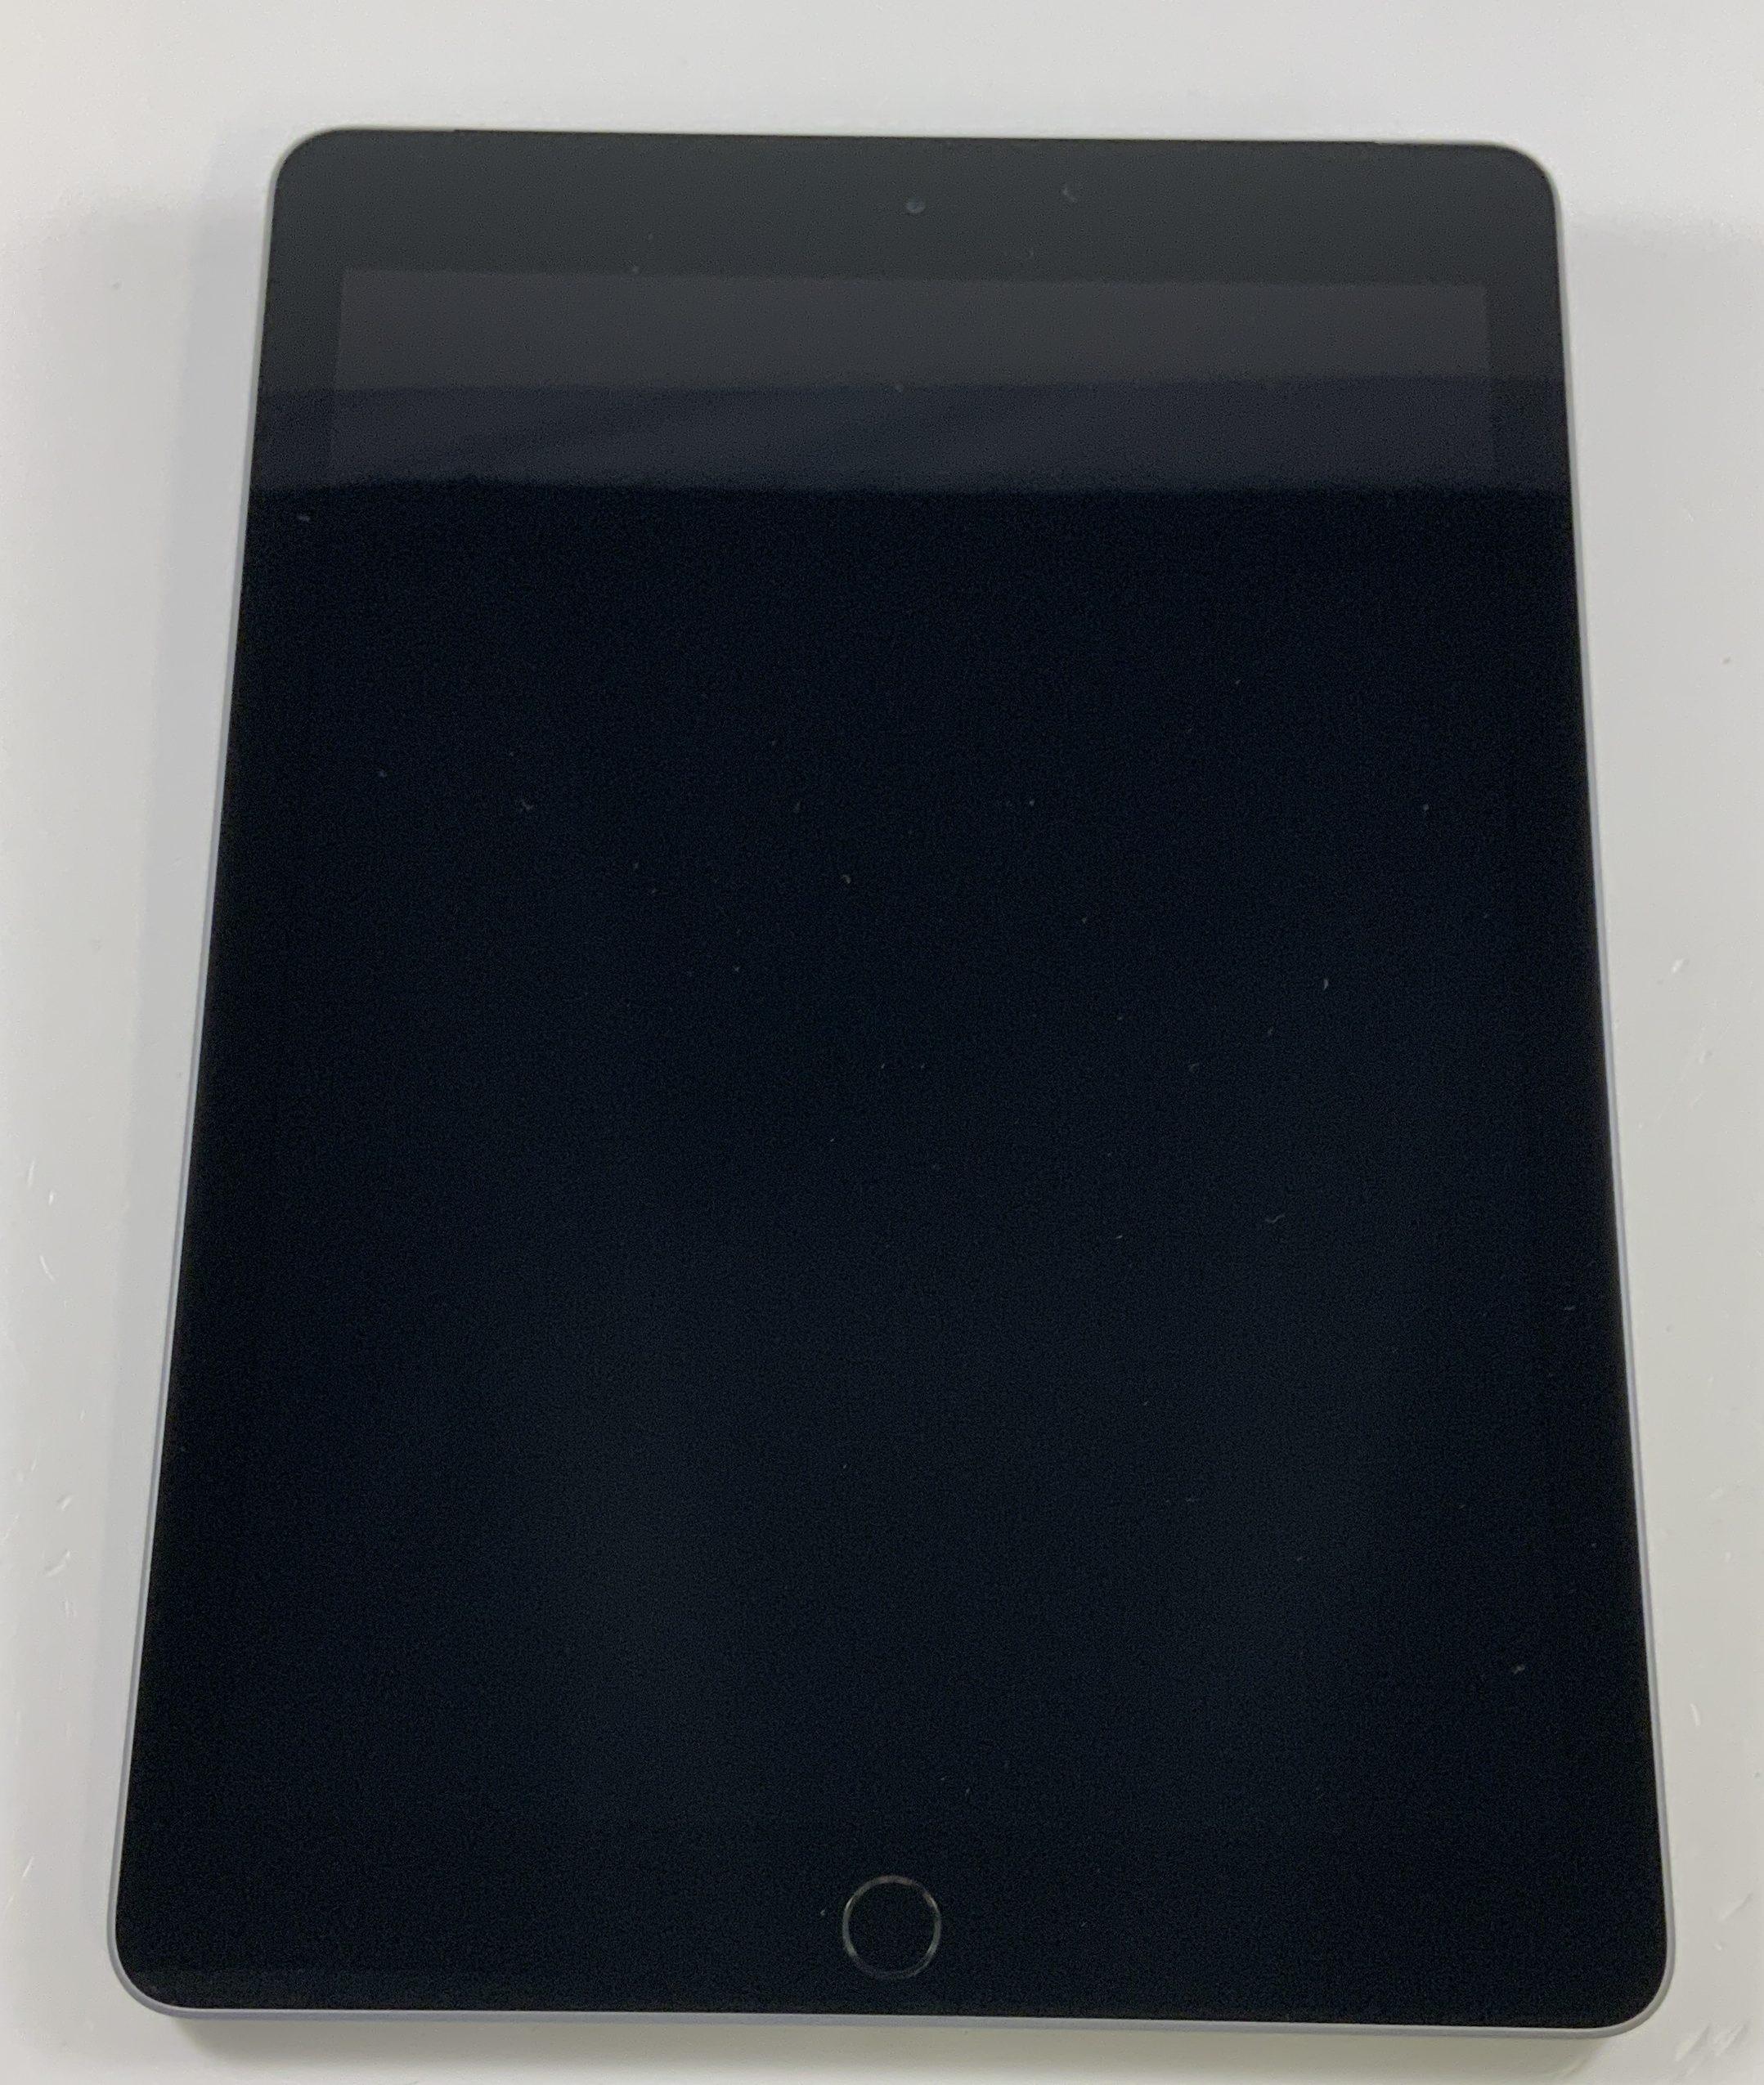 iPad 6 Wi-Fi + Cellular 32GB, 32GB, Space Gray, bild 3